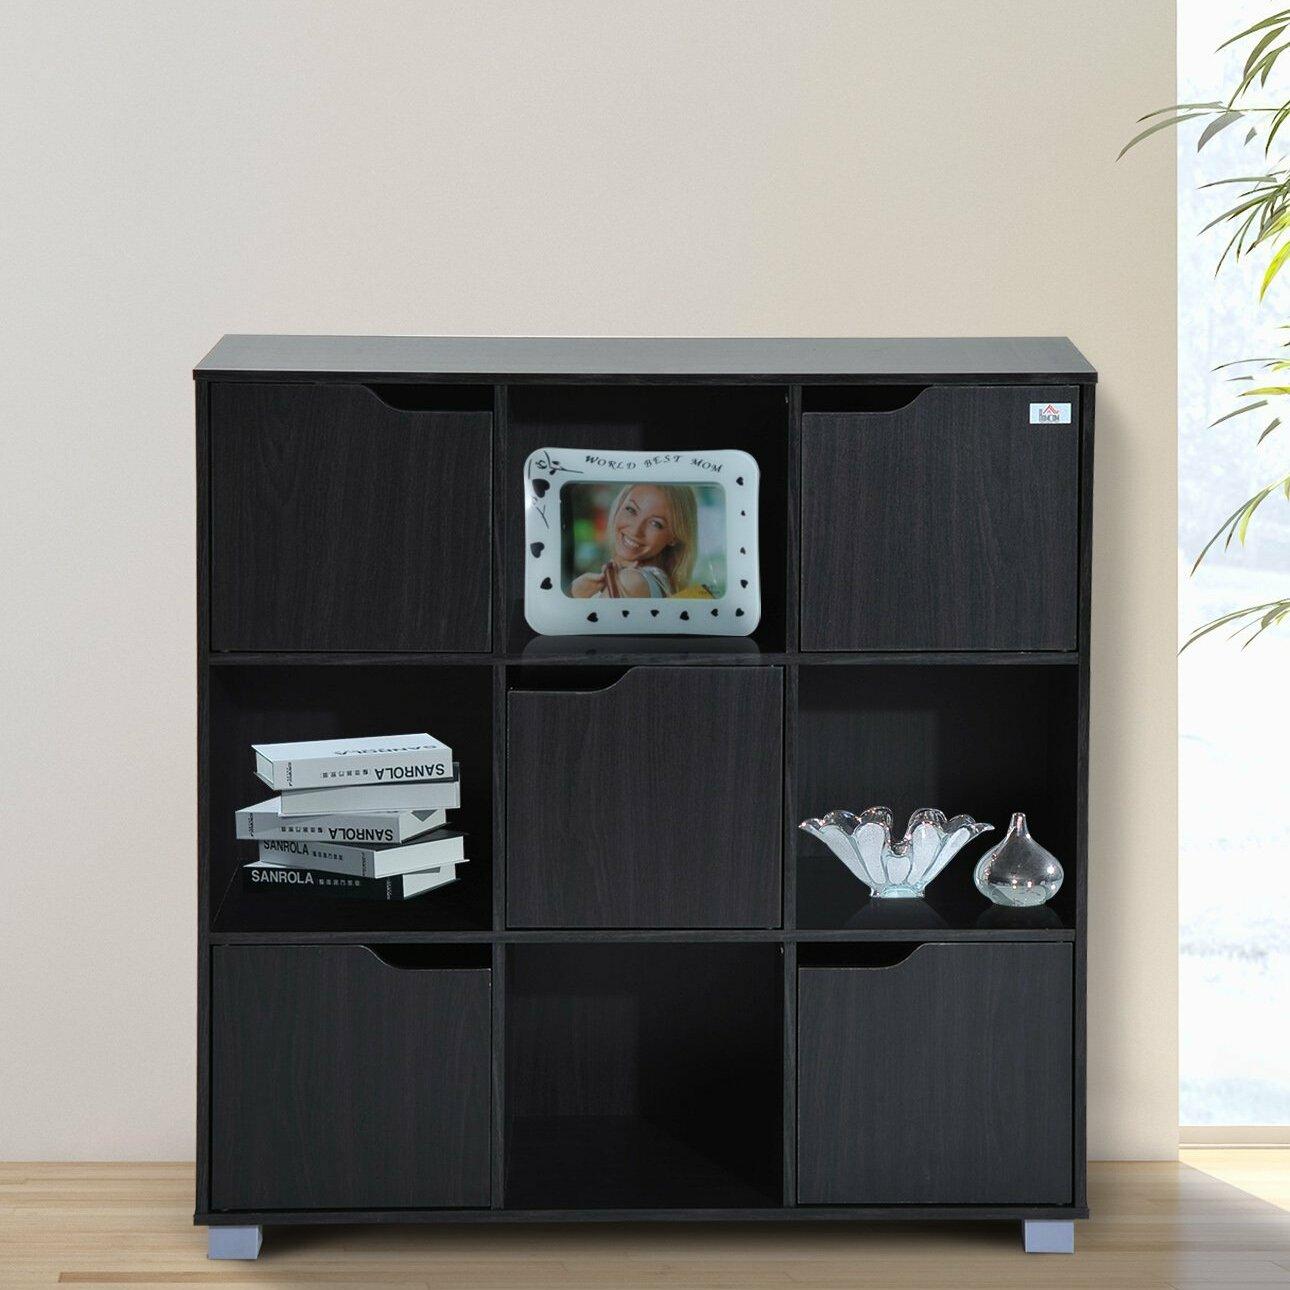 Attirant Red Barrel Studio Thiessen 9 Cubby Storage Organizer Cube Unit Bookcase U0026  Reviews   Wayfair